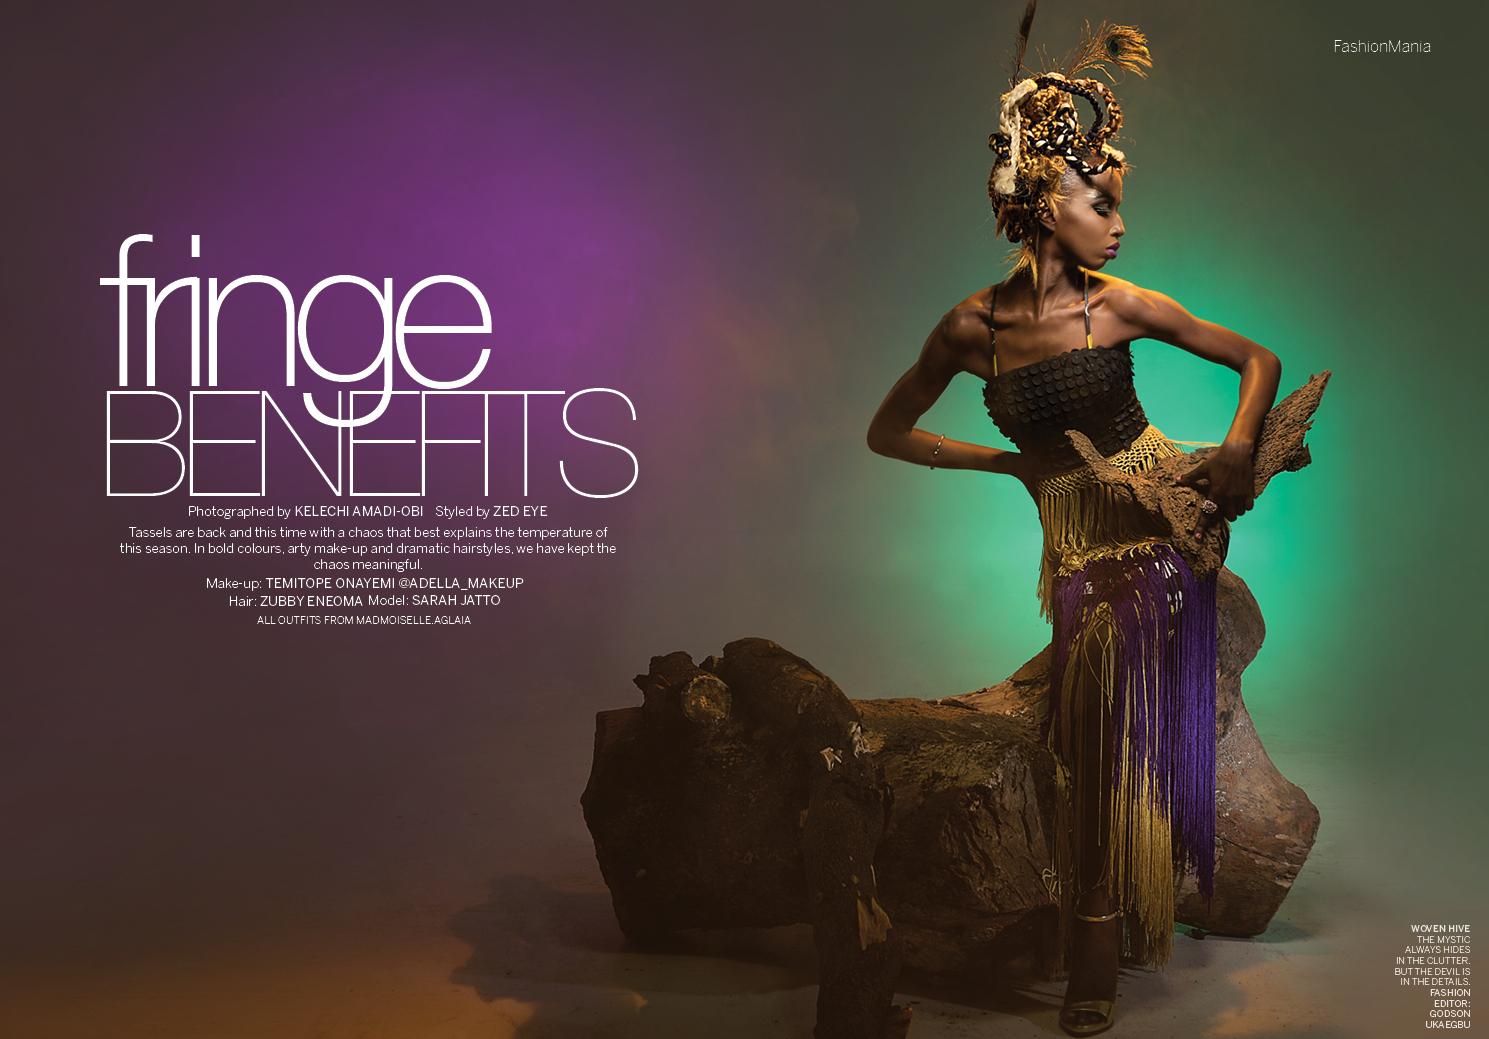 Mania Magazine: The Age Issue